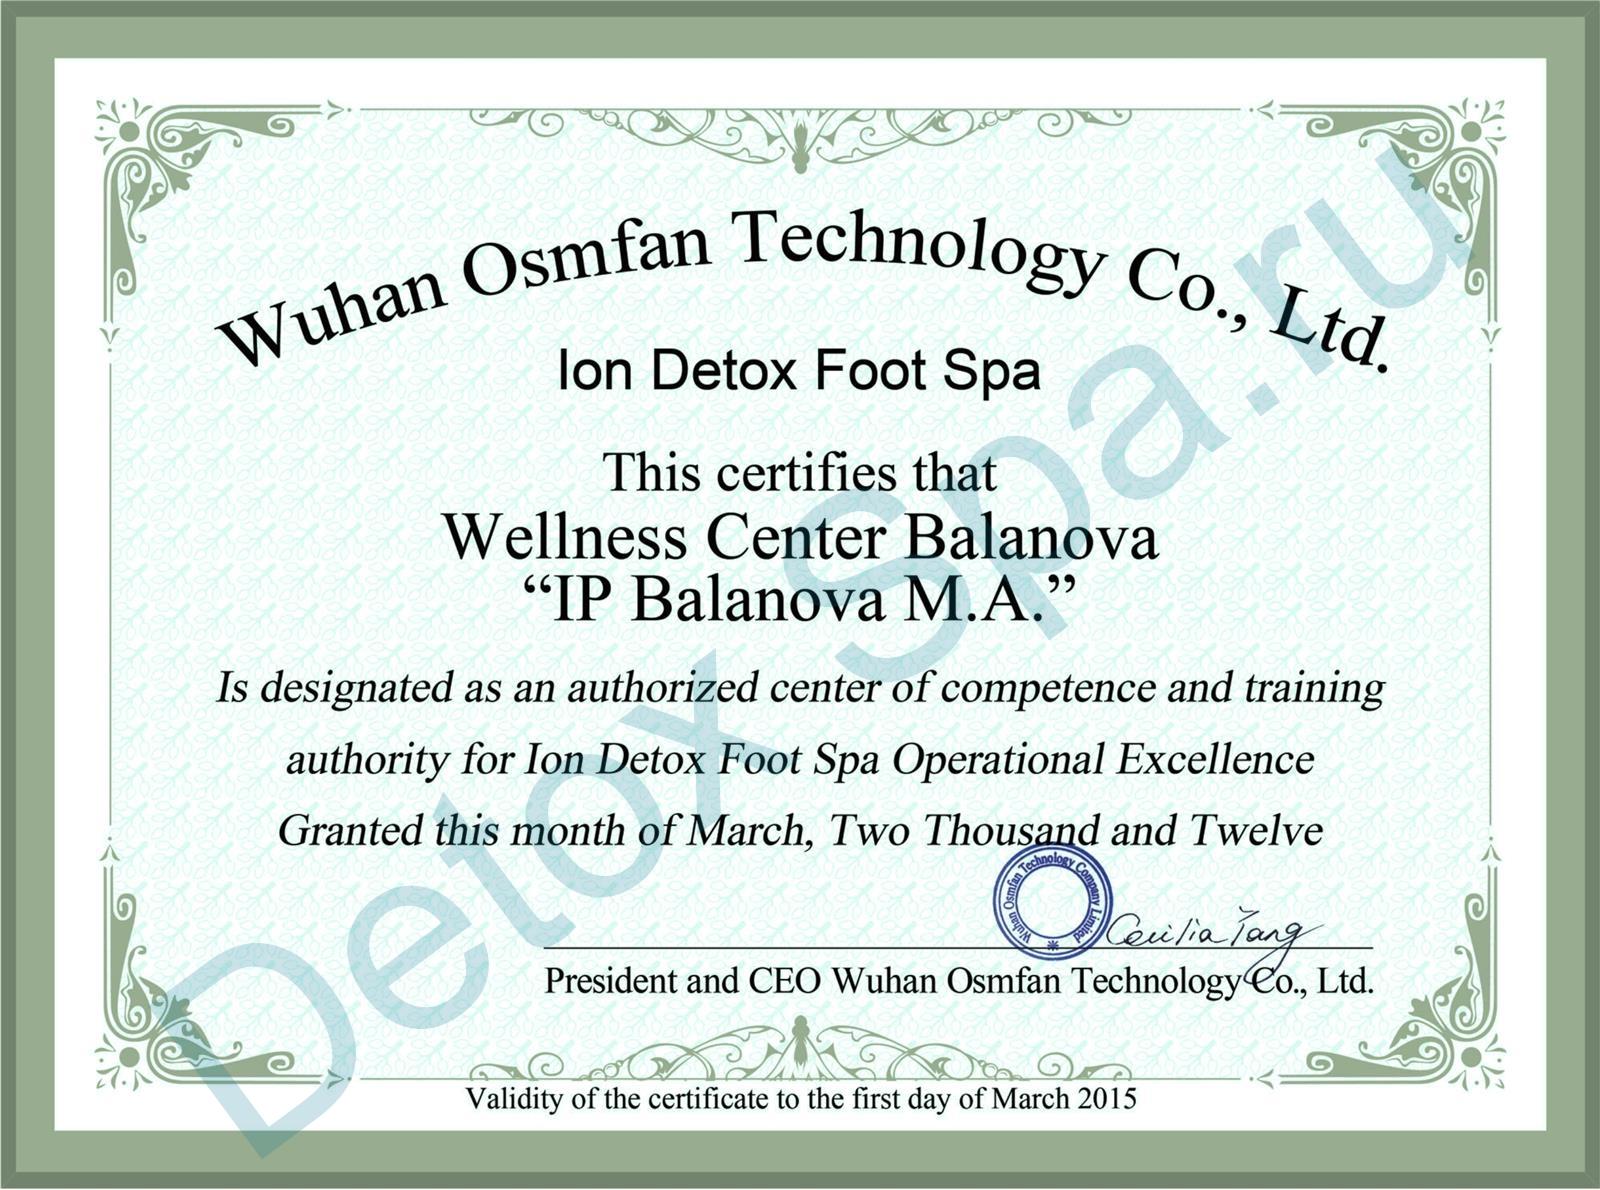 Сертификат на право обучения Ion Detox Spa